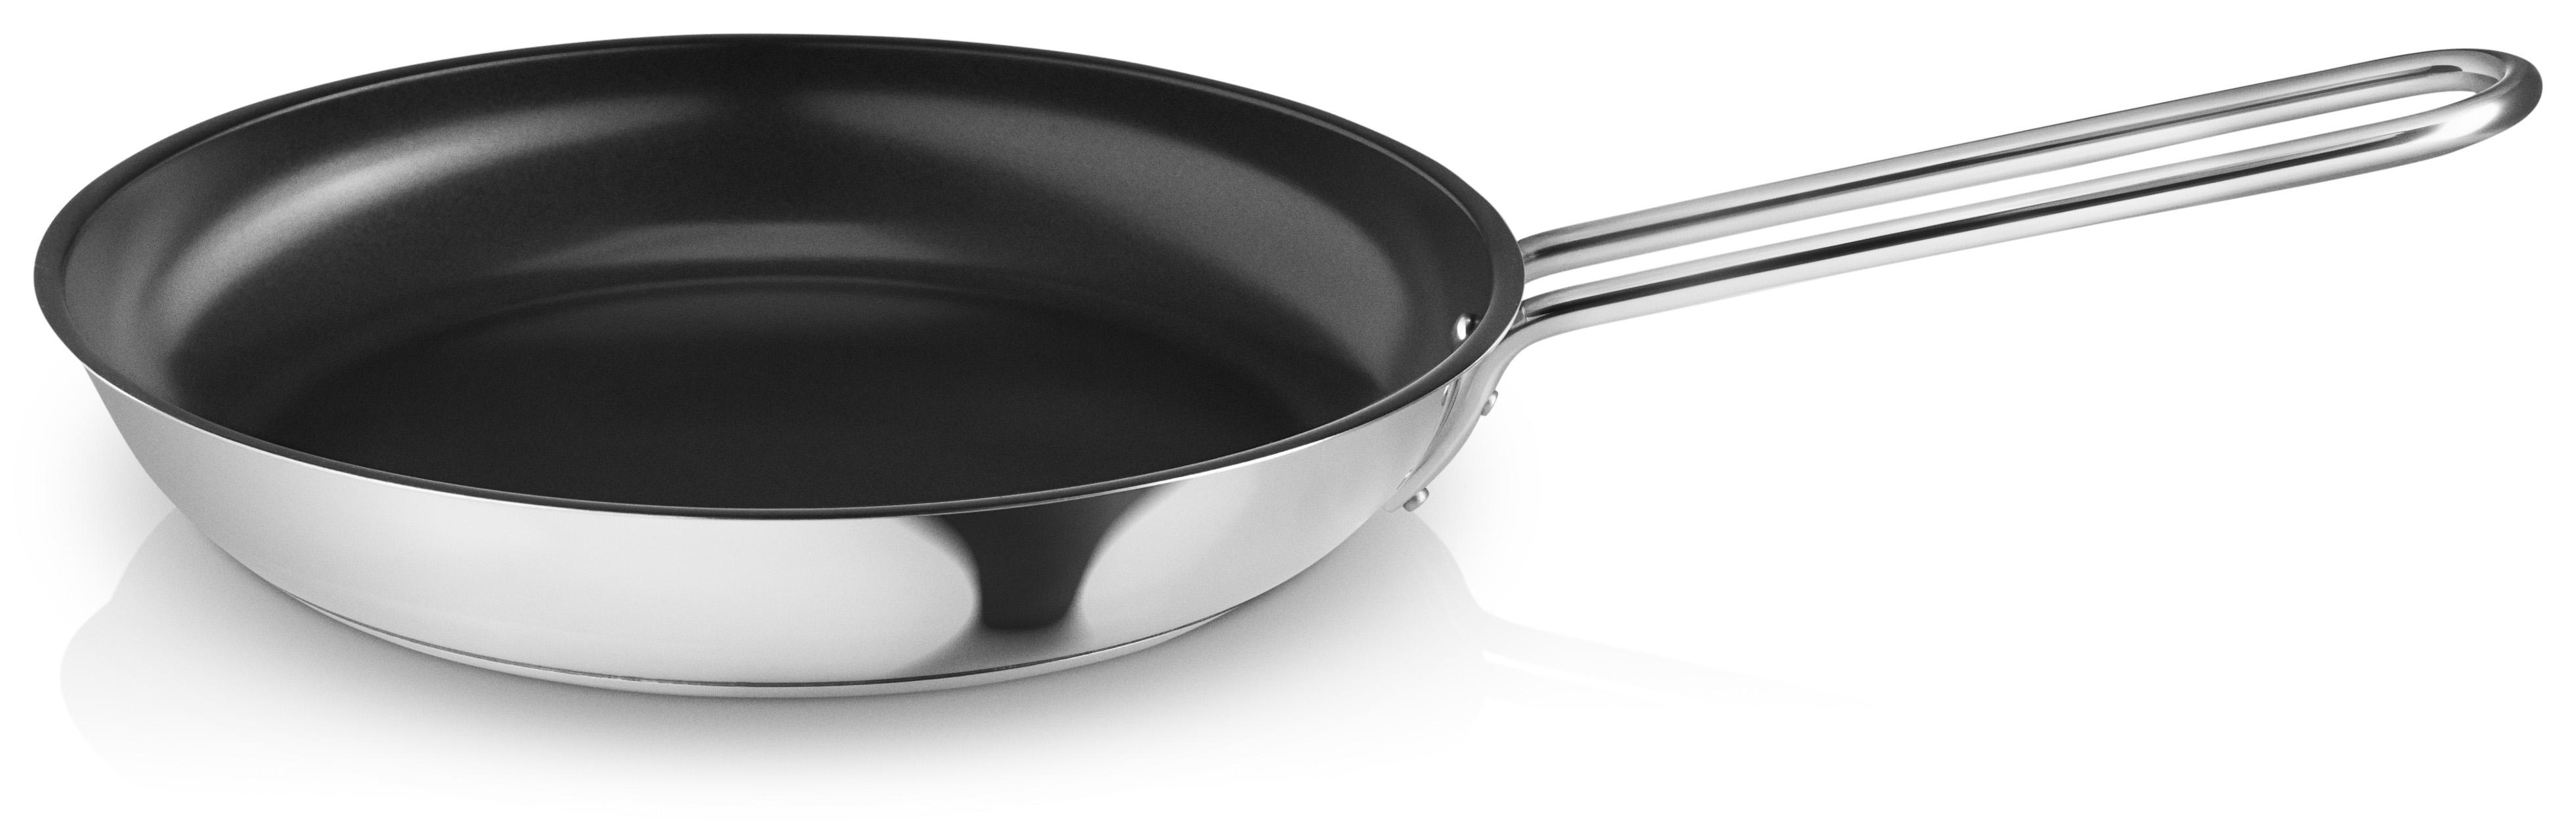 Eva Trio - Frying Pan With Ceramic Coating 24 cm (202511)